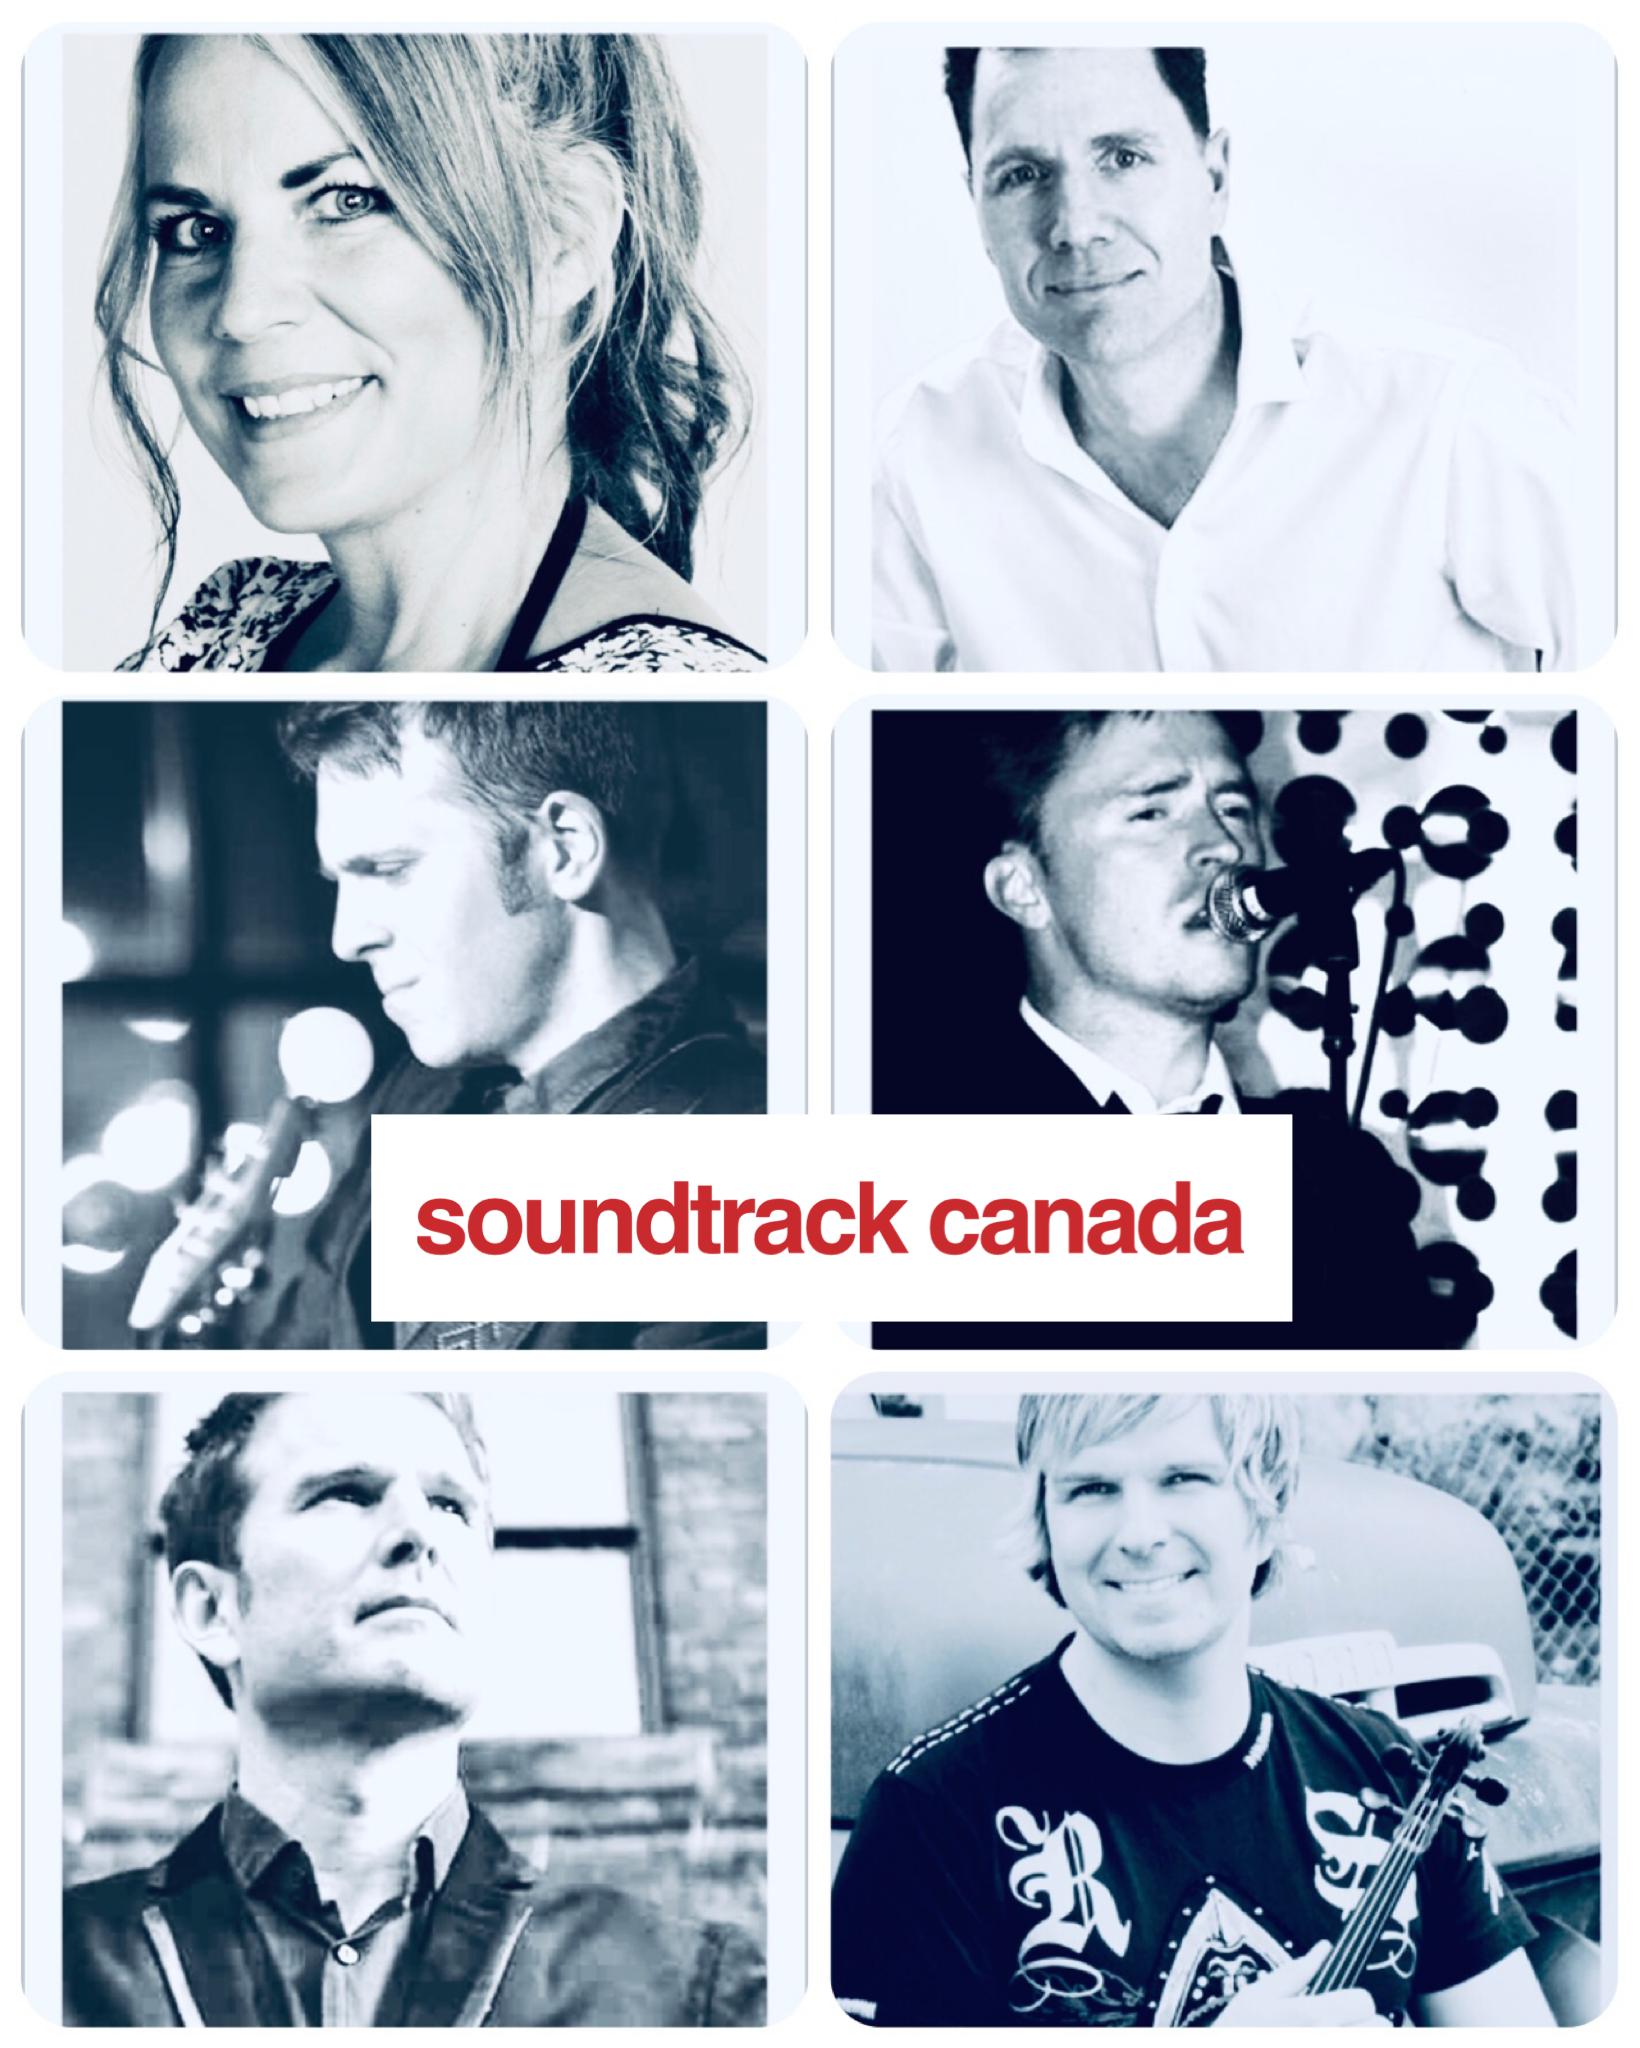 SoundTrack Canada